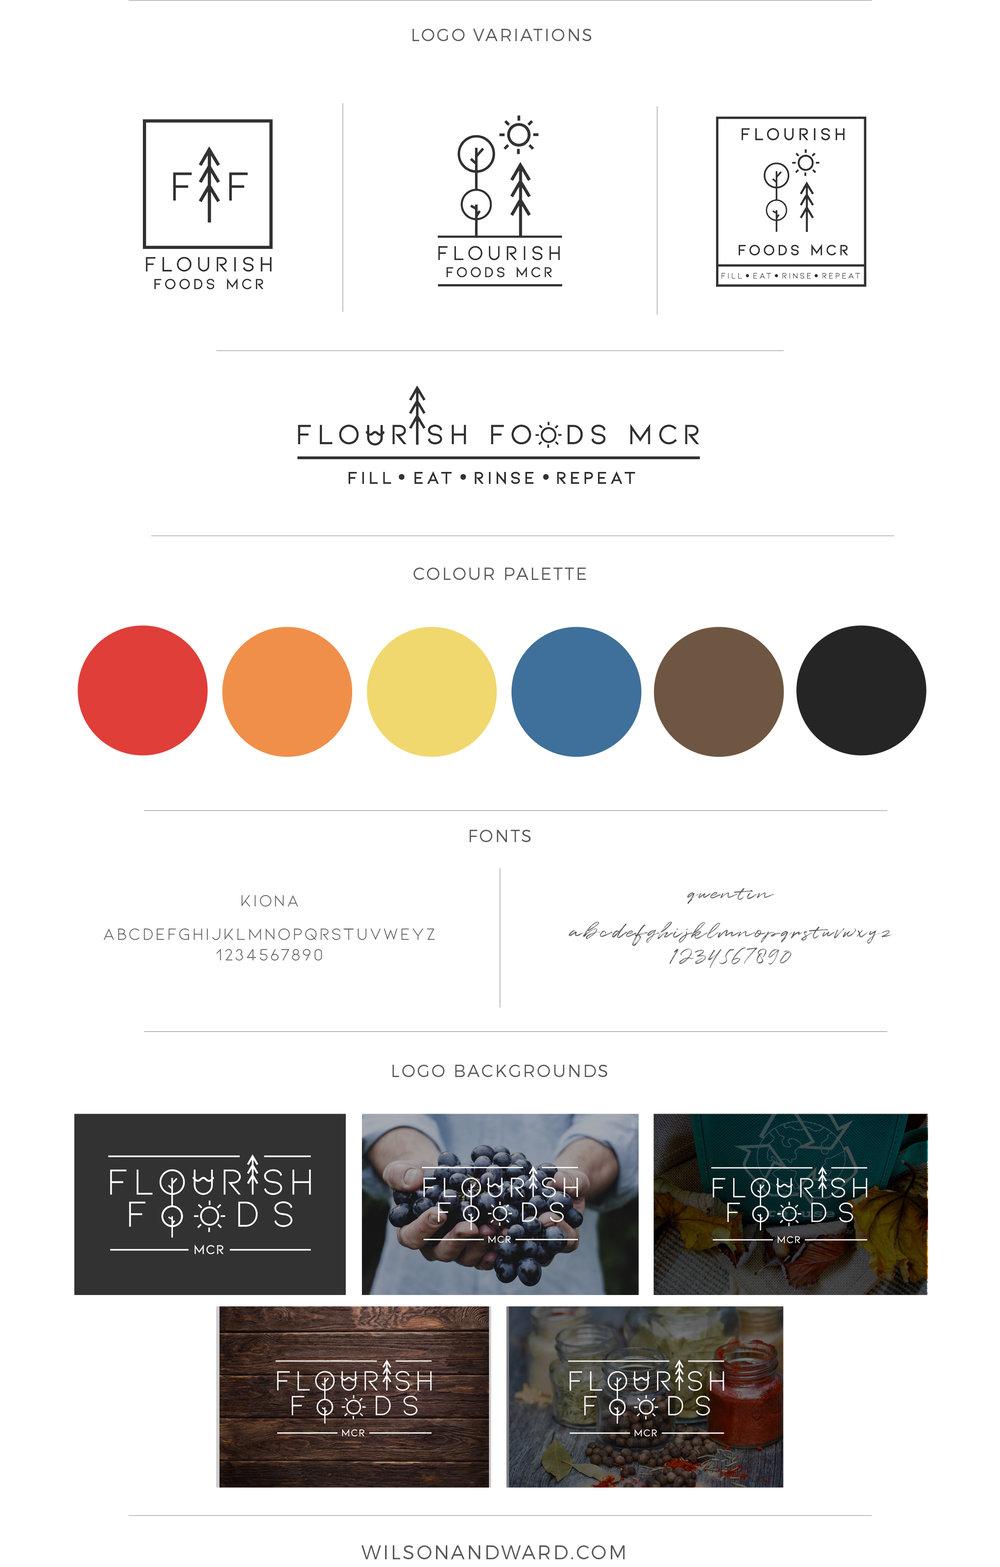 Flourish-Foods-MCR-branding-wilson-and-ward.jpg